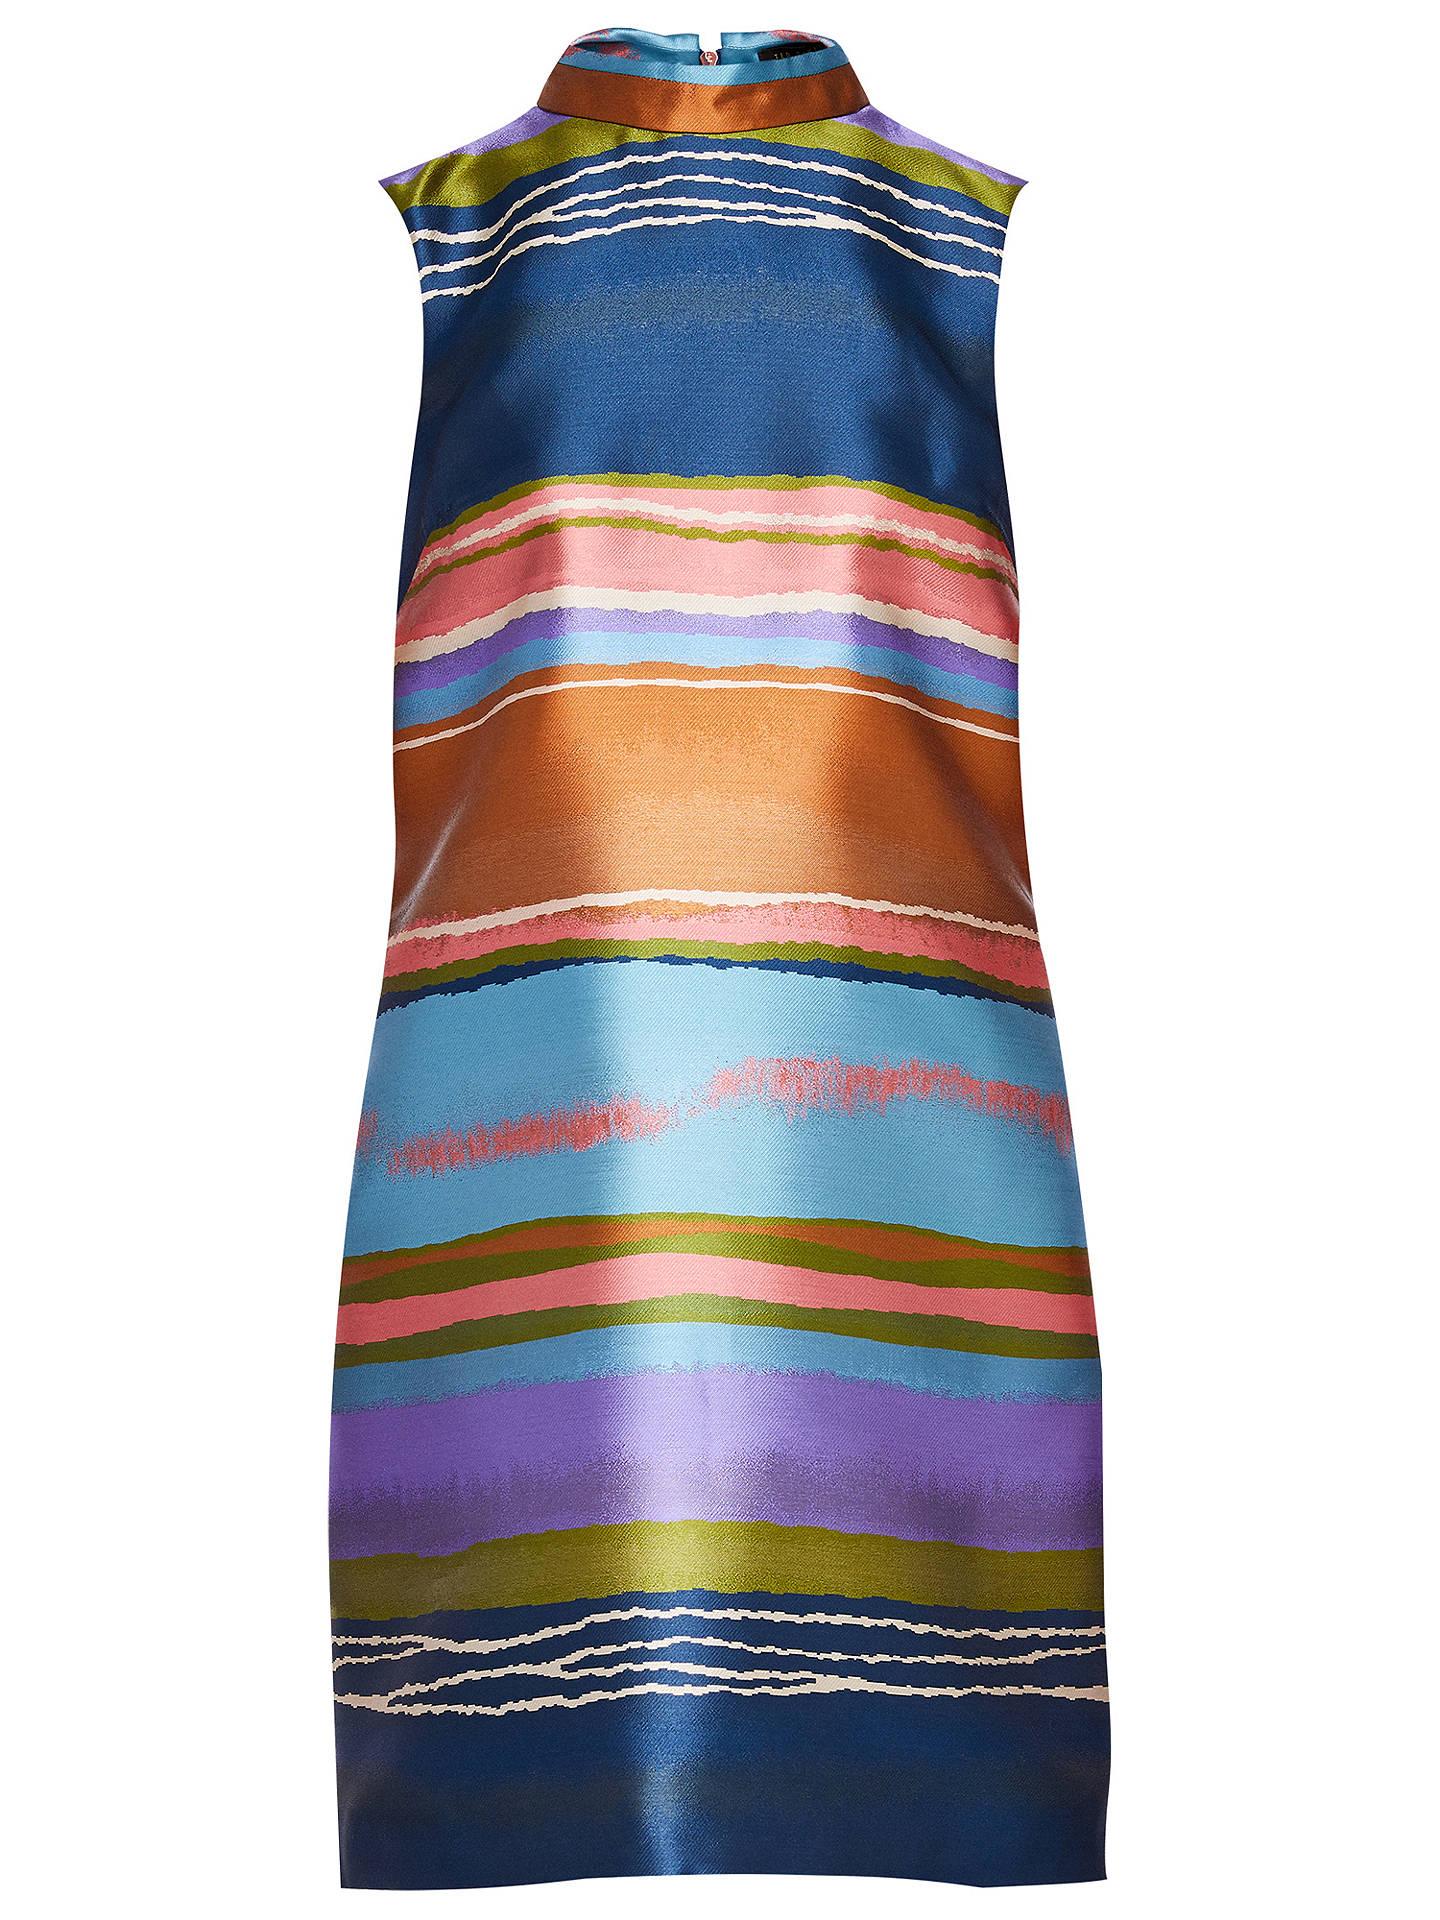 b93e19e1d0dbf9 ... Buy Ted Baker Ivara Striped Dress